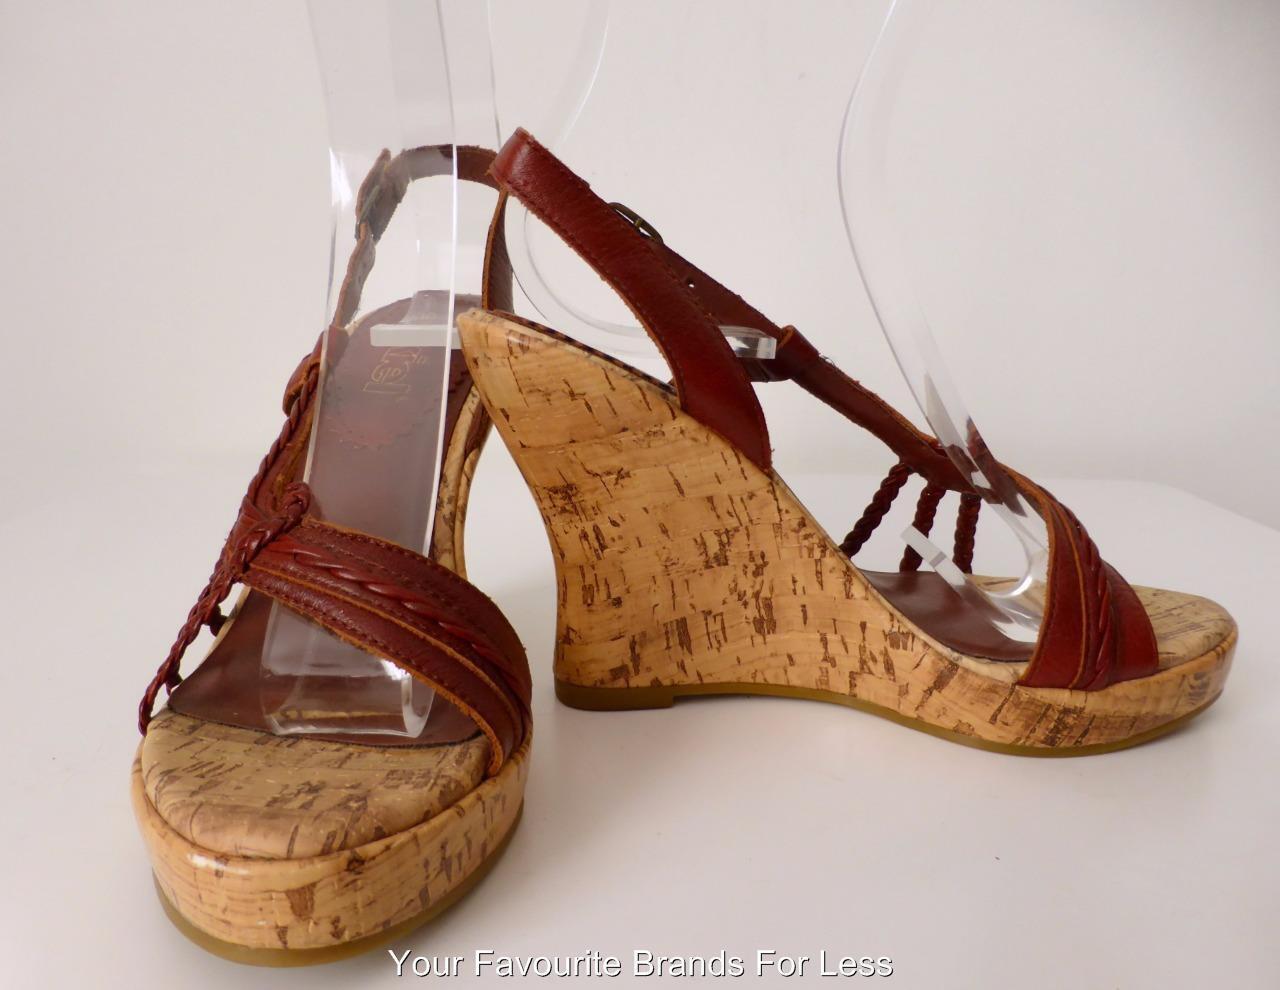 AKIEL Größe 6 Braun Leder and Cork Open Toe Wedges Schuhes